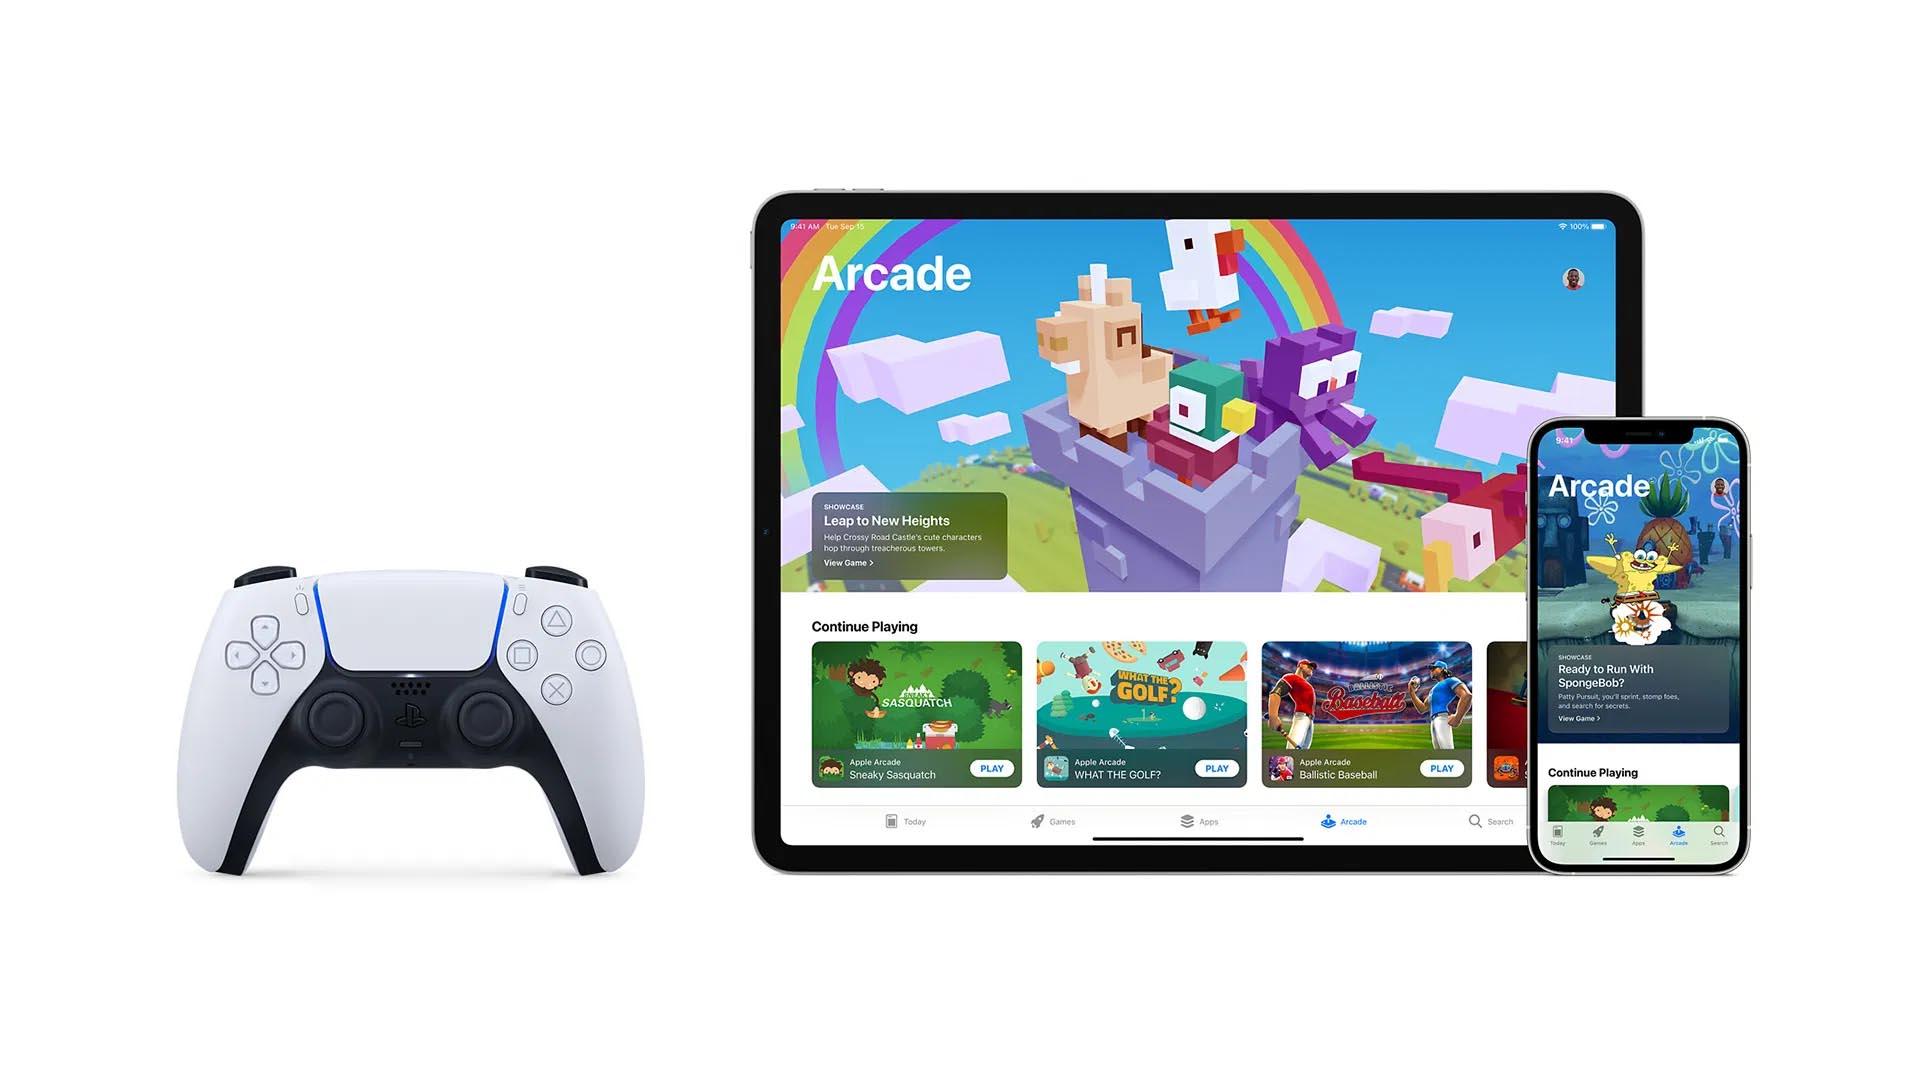 Il gamepad Sony PlayStation DualSense in vendita su Apple Store